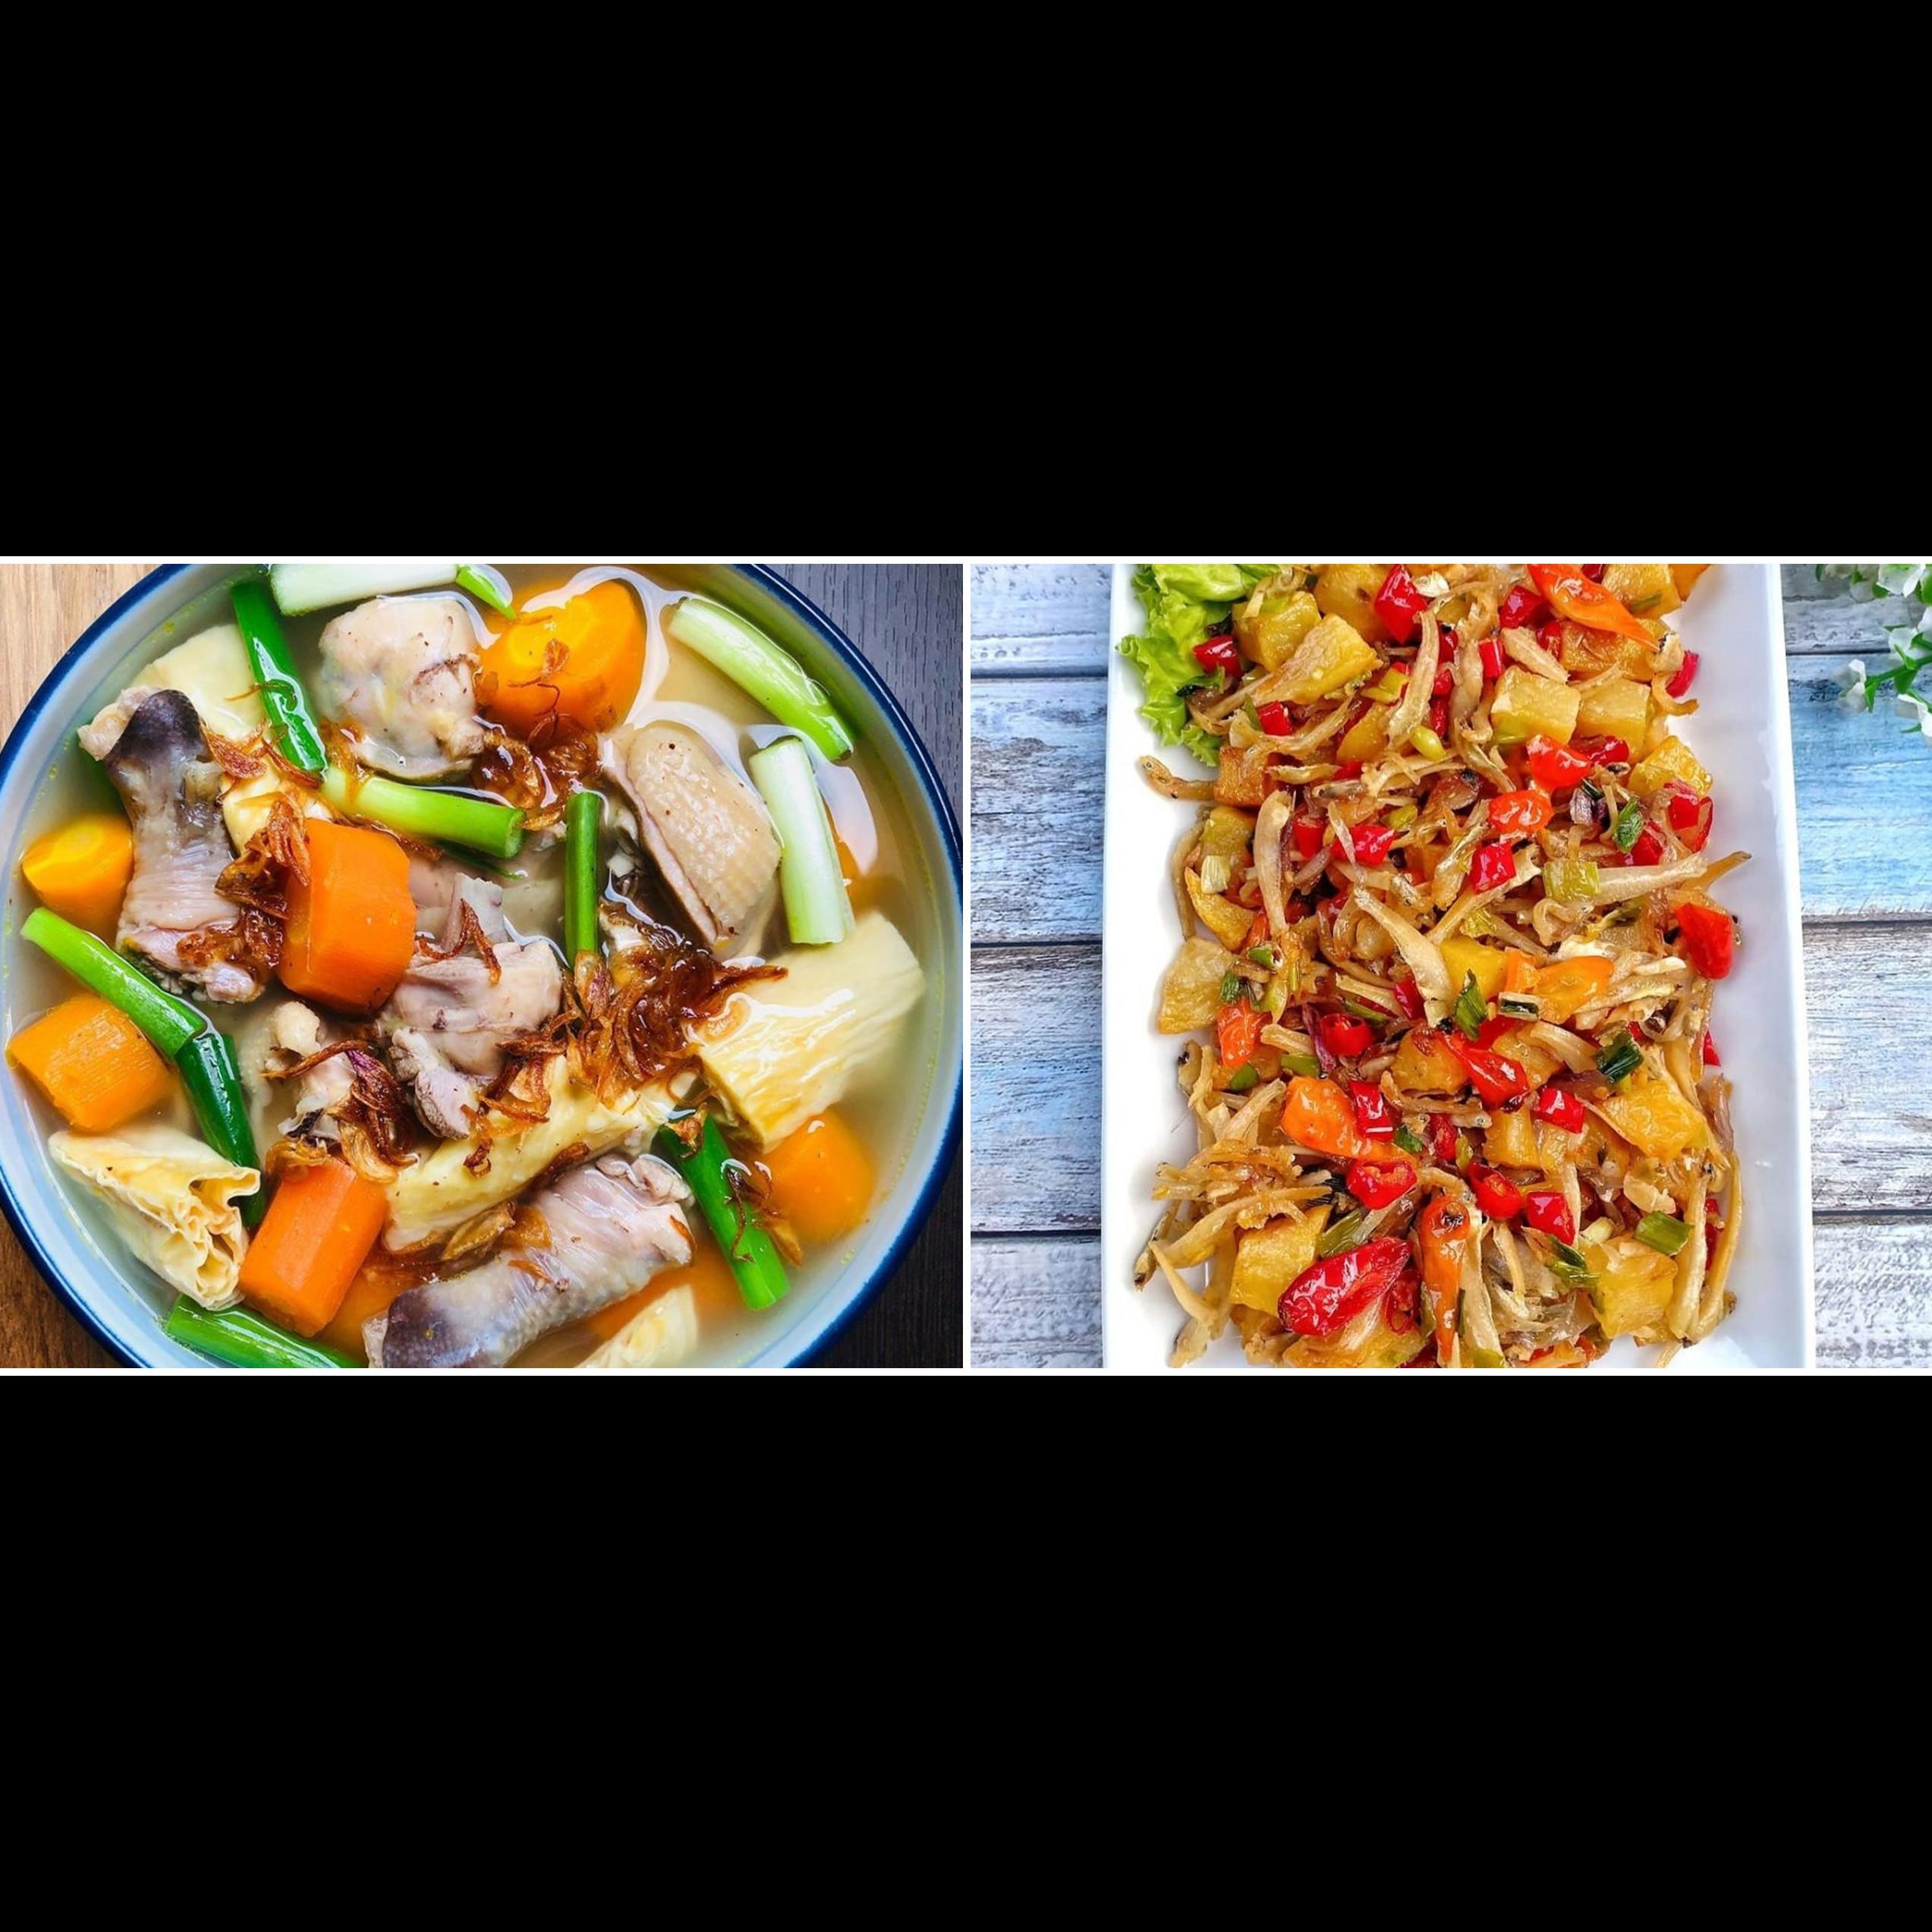 30 Resep masakan menu buka puasa Ramadhan, enak, praktis, mudah dibuat